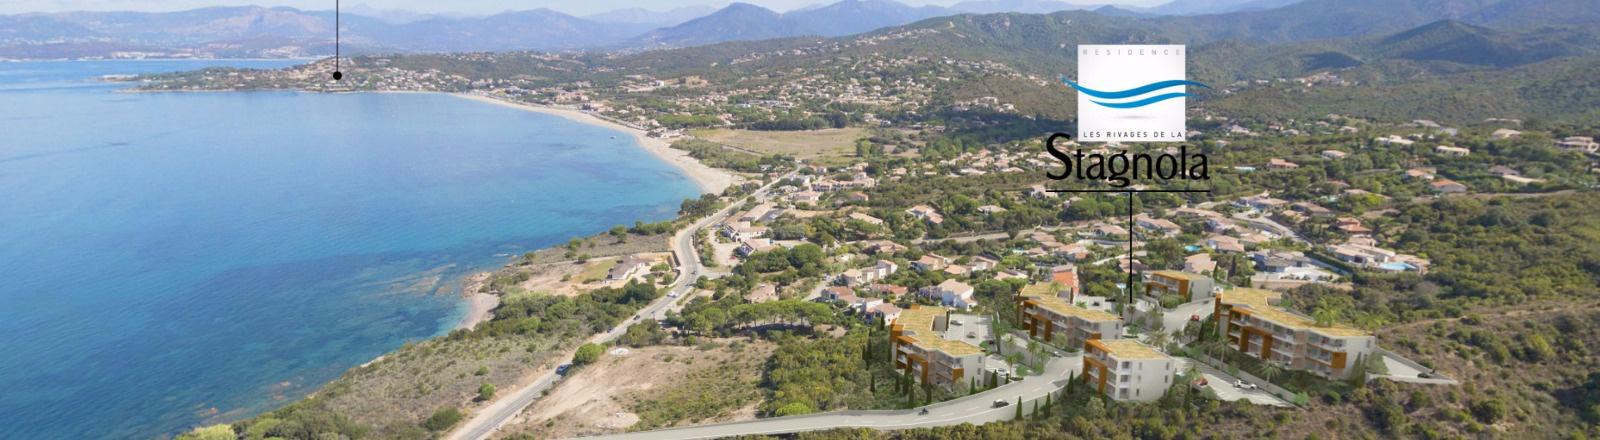 Les rivages de la Stagnola Programme neuf Porticcio